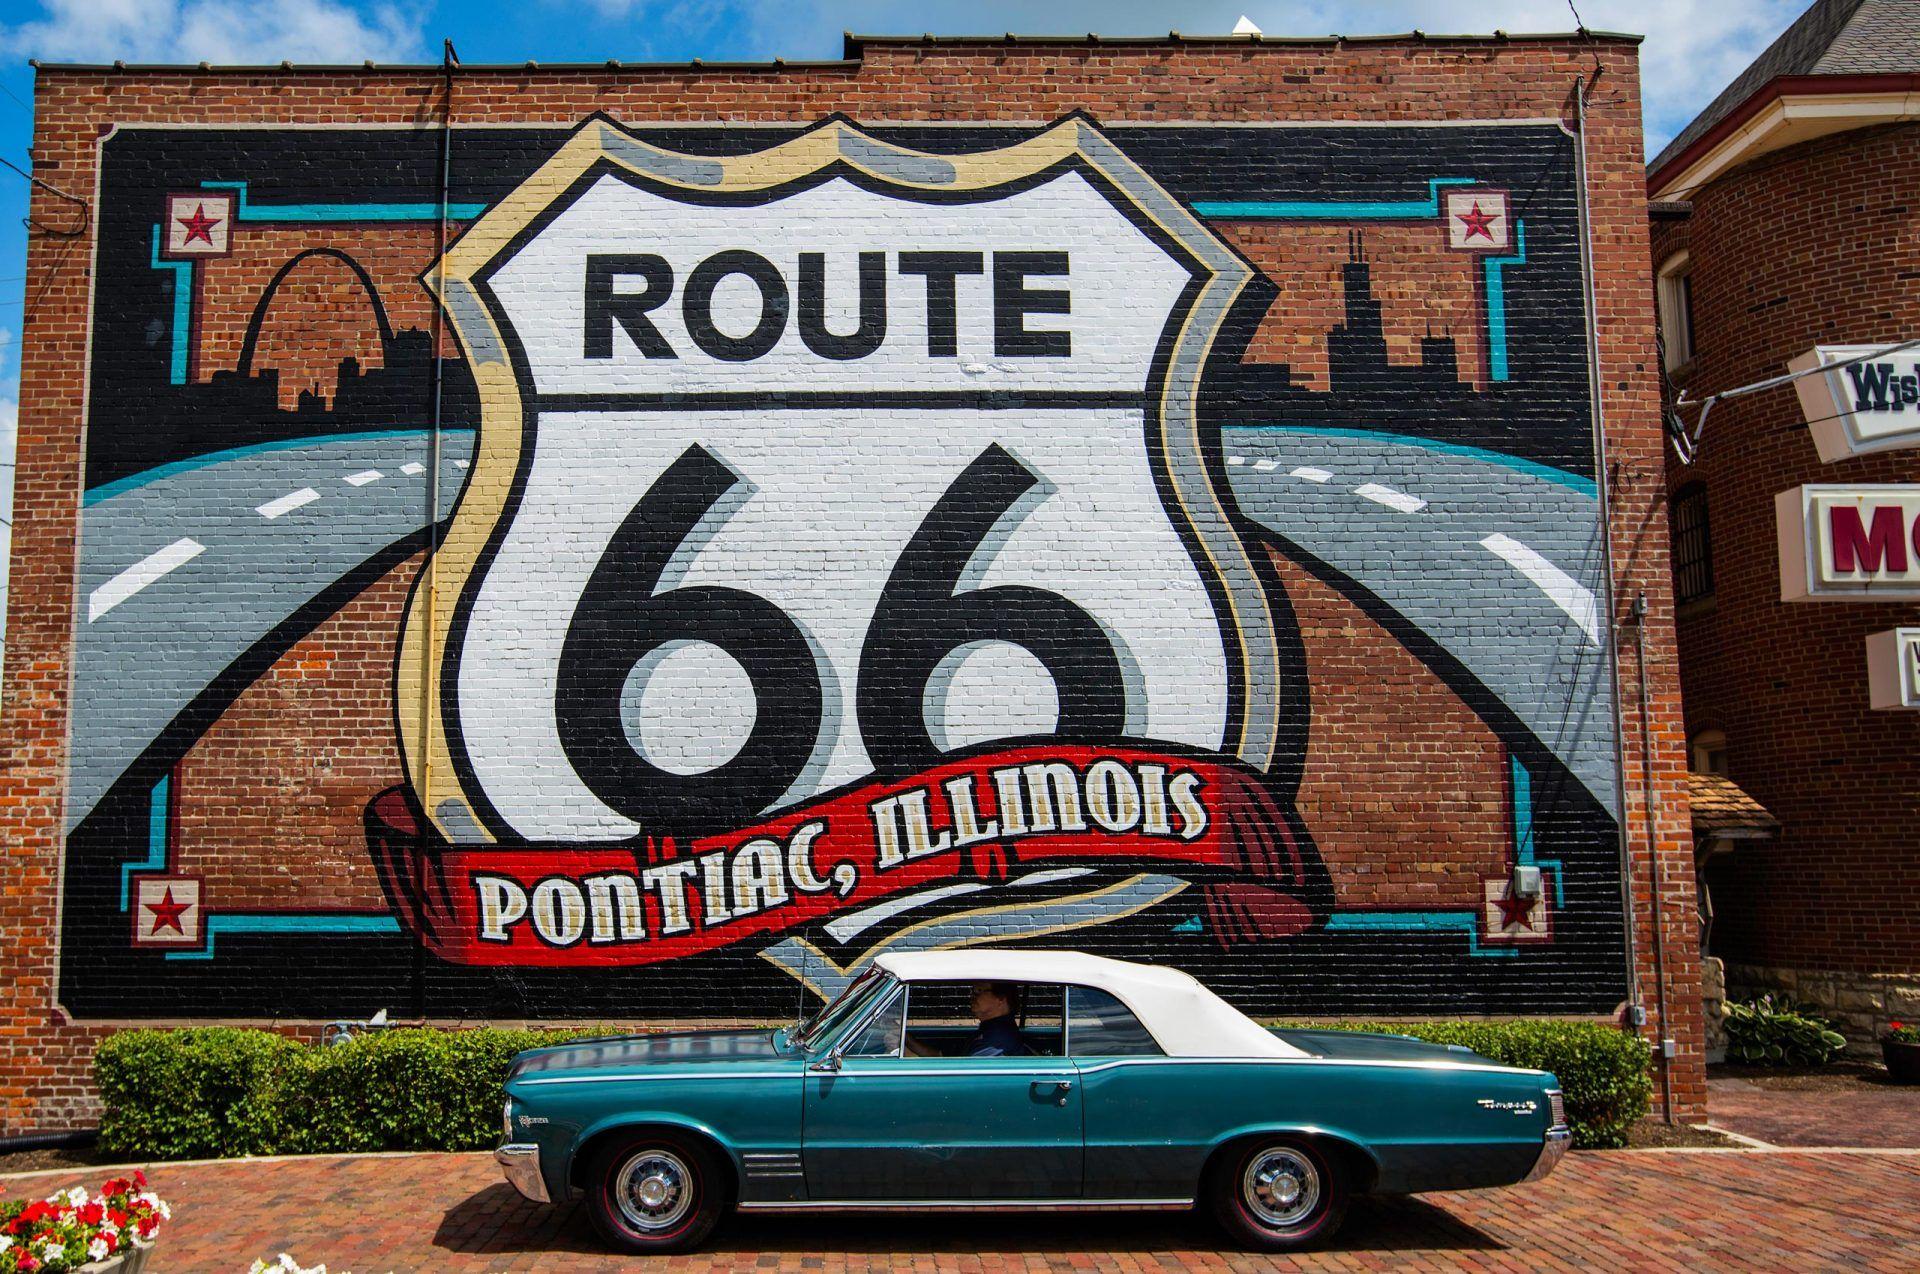 Road Trip US Route 66 Illinois